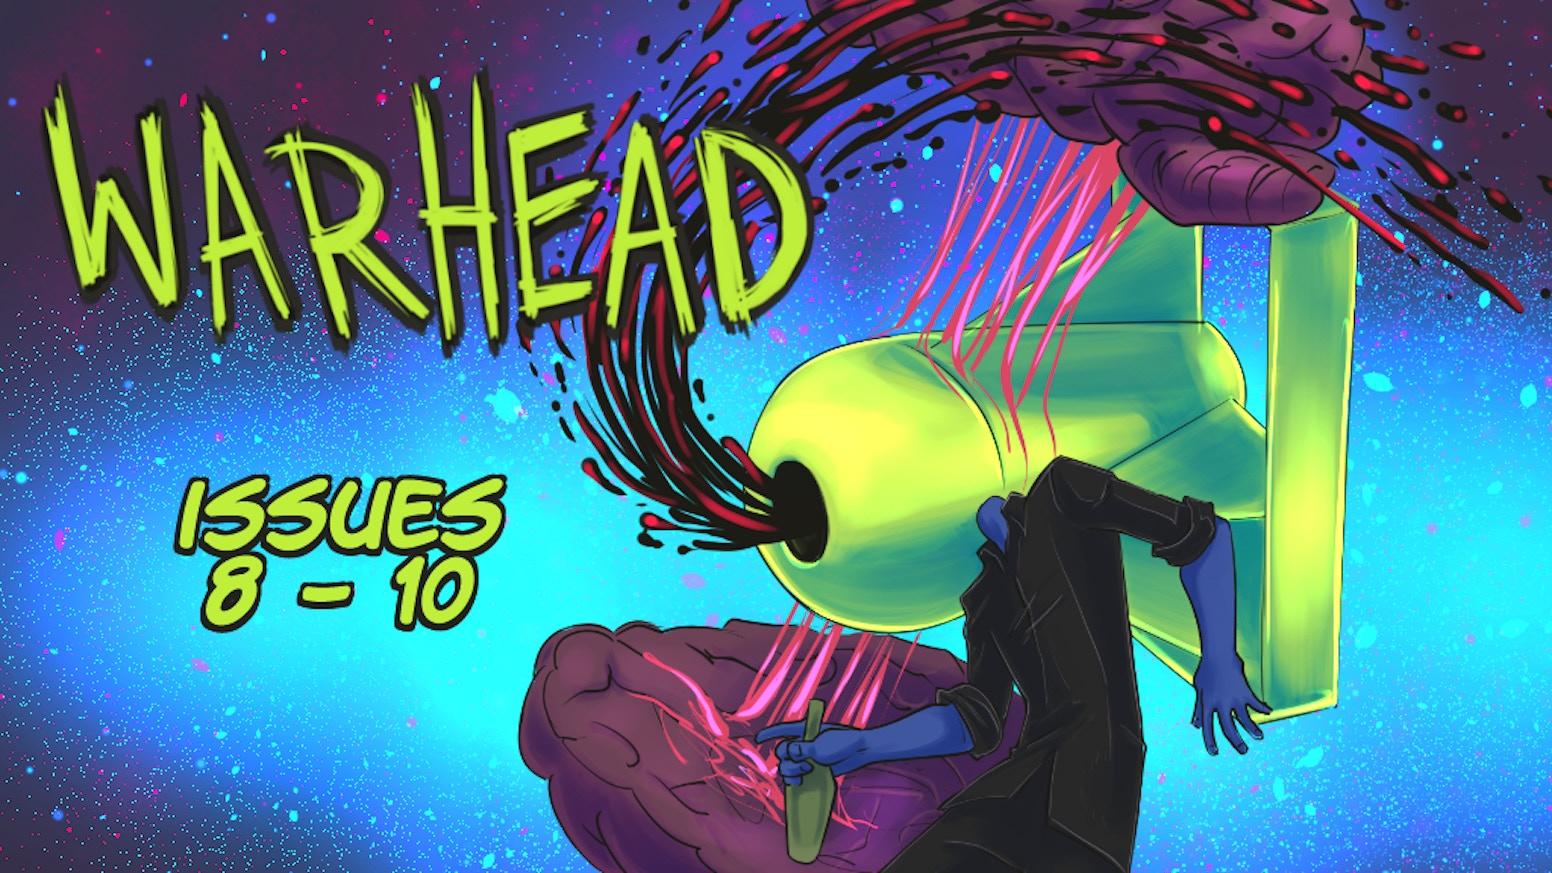 WARHEAD Issues 8, 9 & 10!